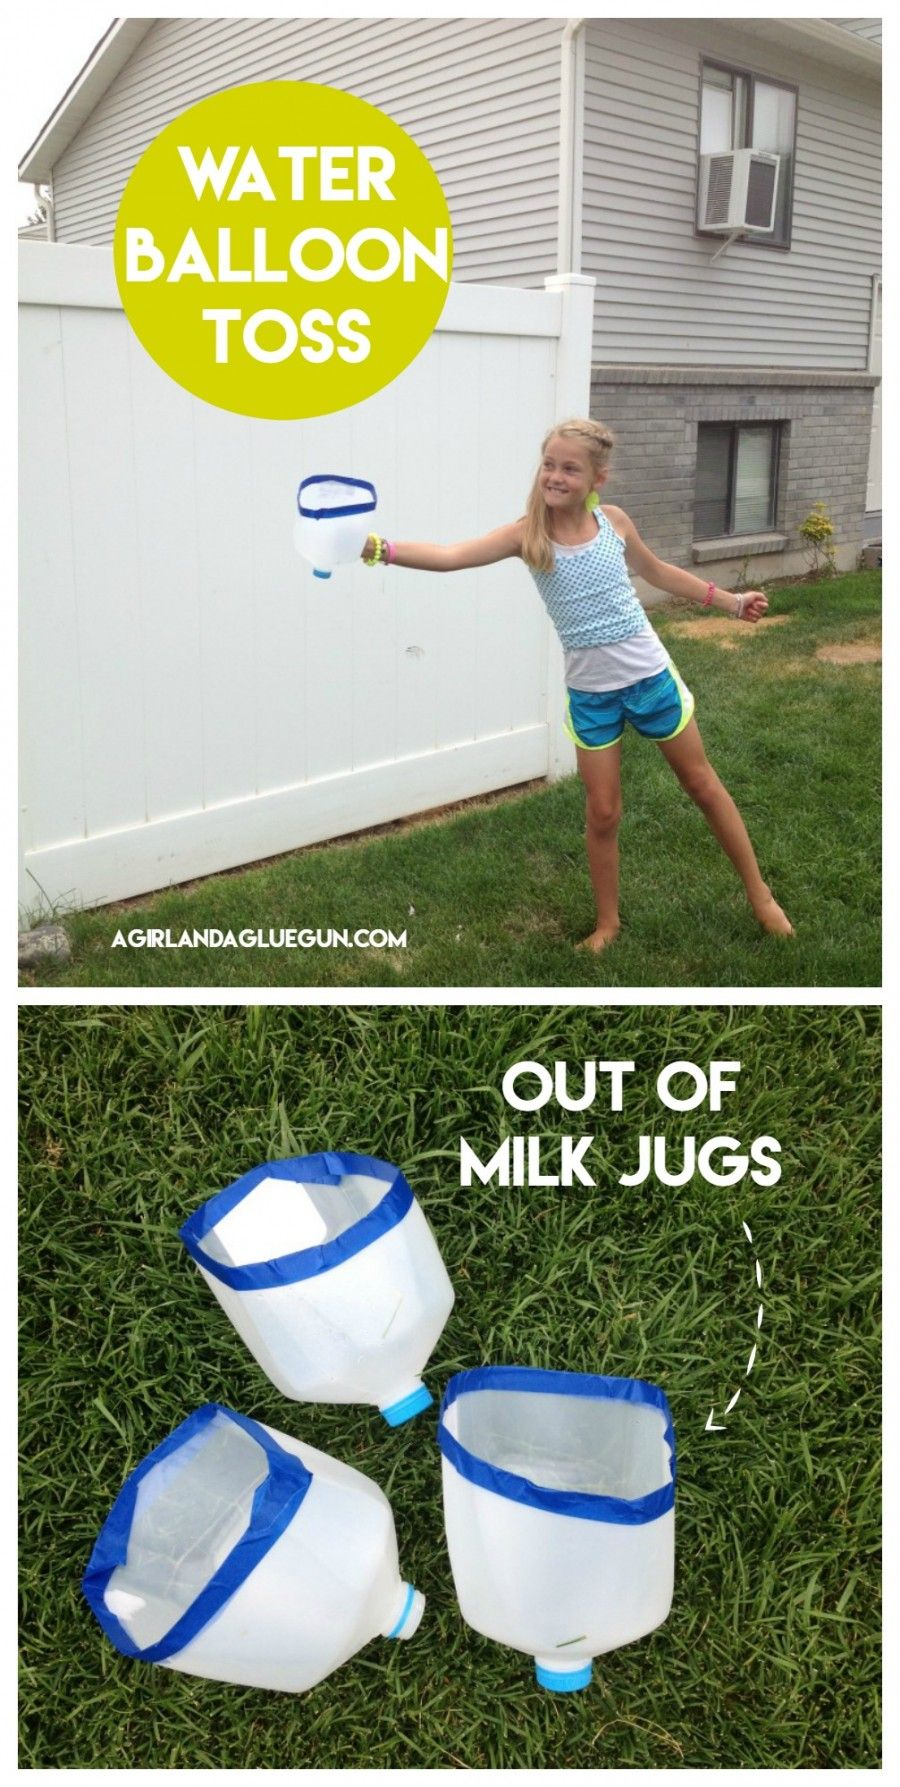 Water Balloon Toss Out Of Milk Jugs Fun Summer Hack School